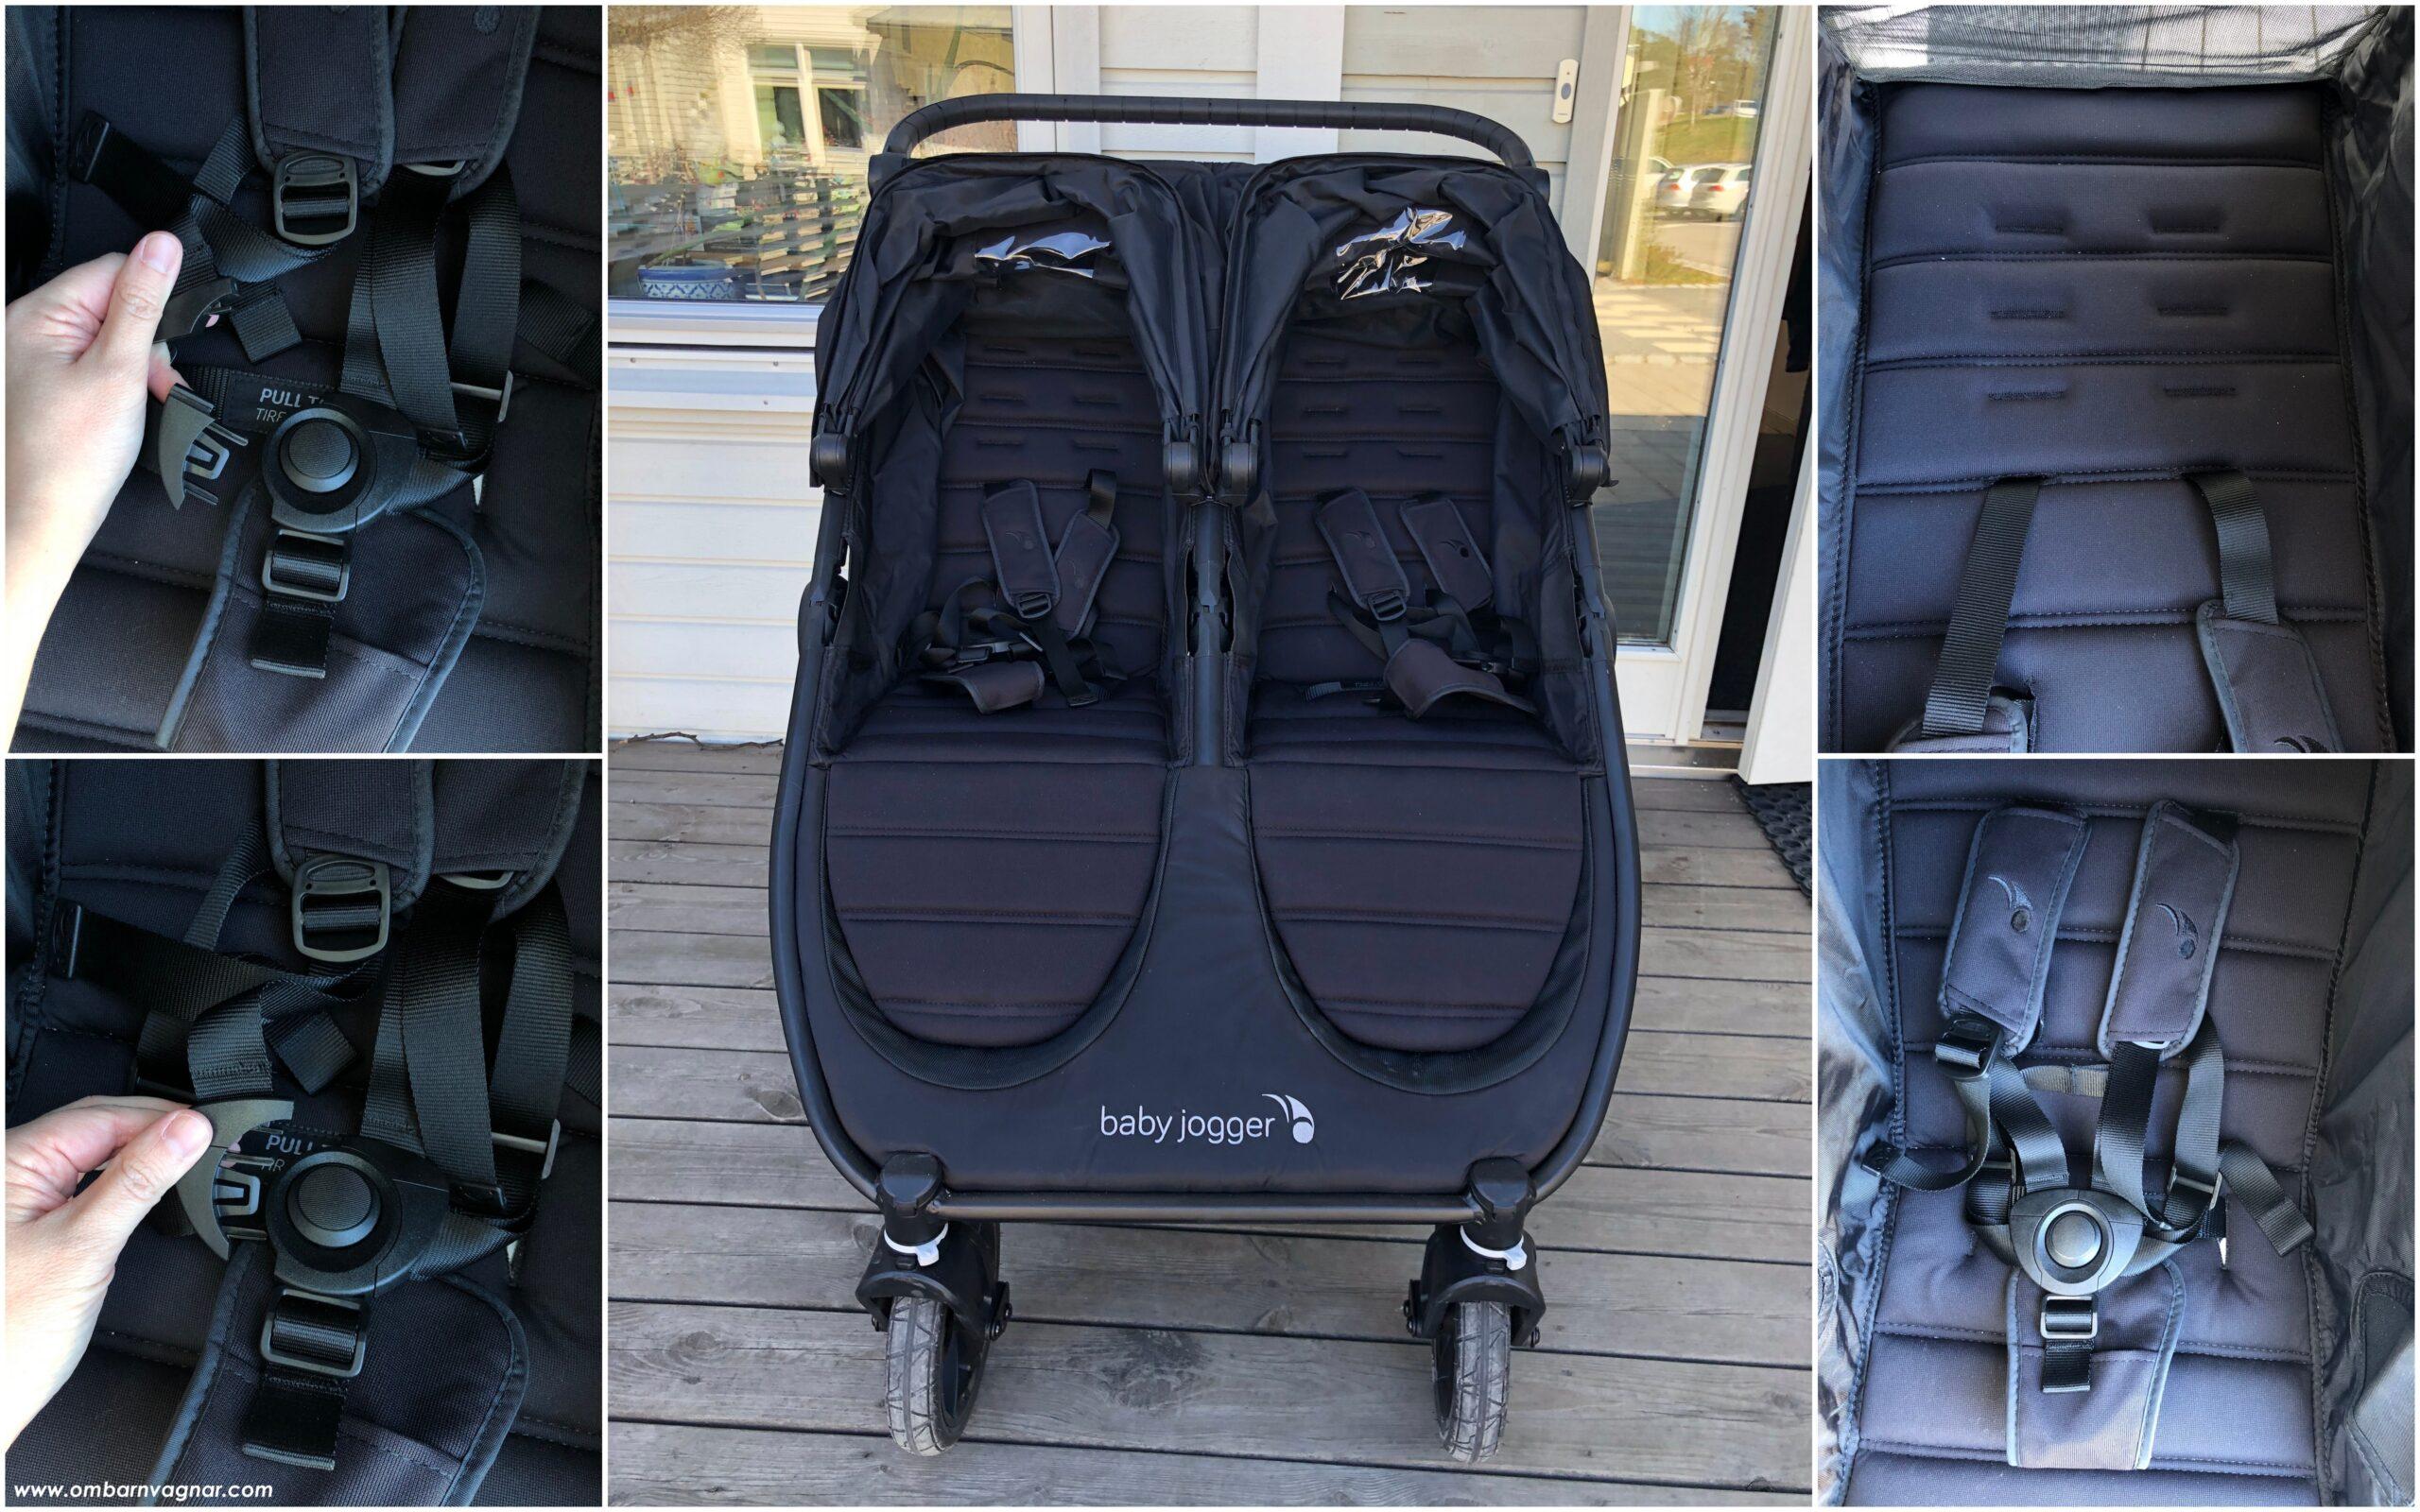 Baby Jogger City Mini GT 2 Double har vanliga sittdelar med delbar sele